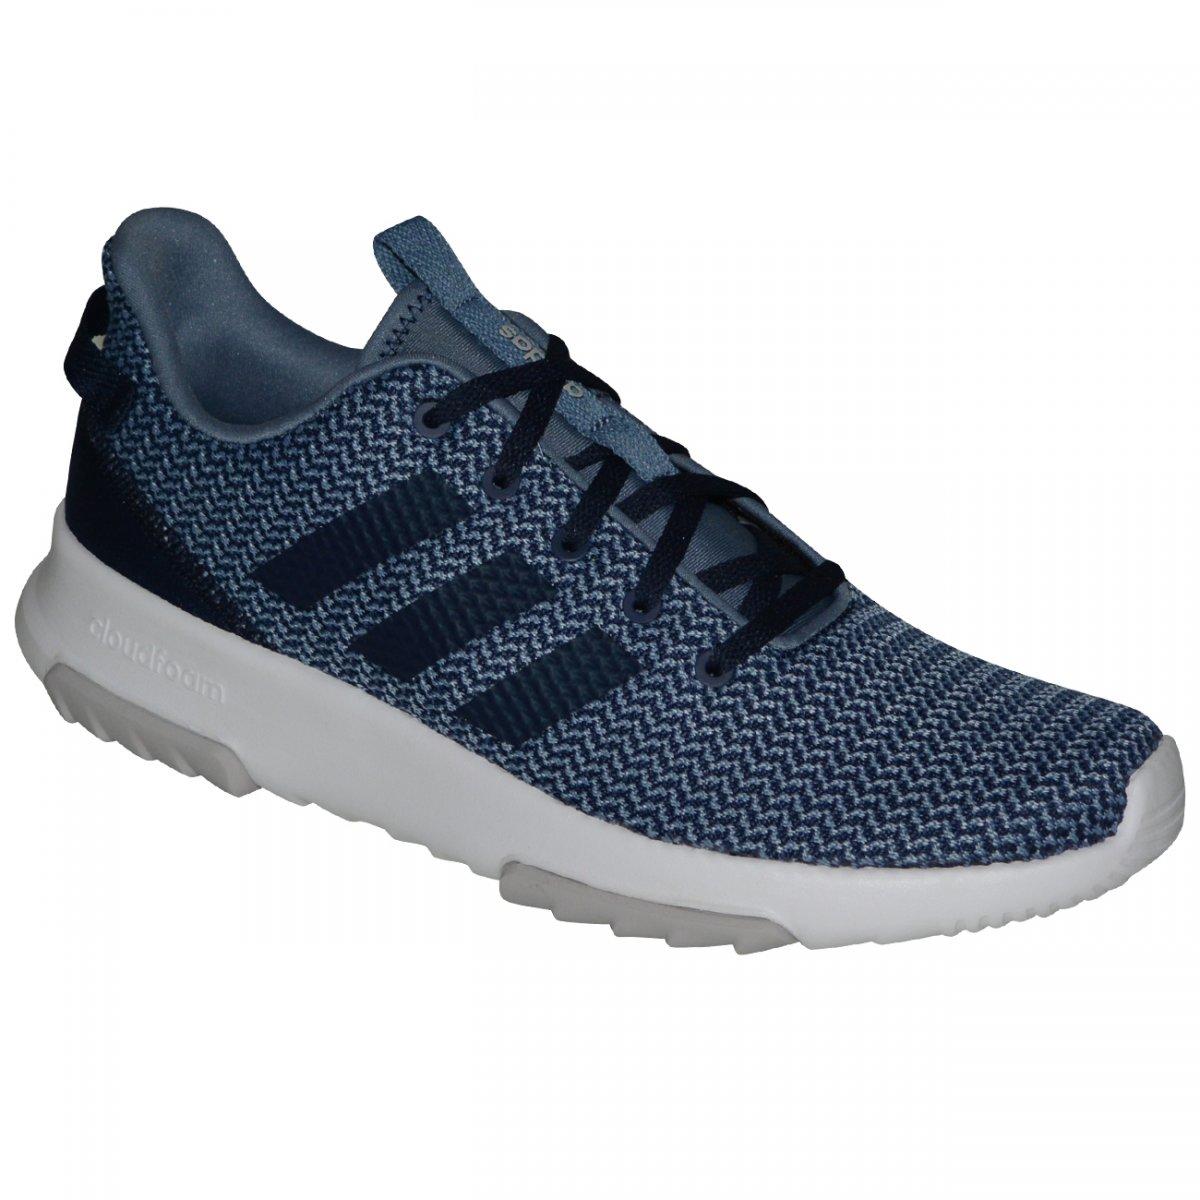 0e3c383c4c5 Tenis Adidas CF Racer TR DB0693 - Azul marinho - Chuteira Nike ...